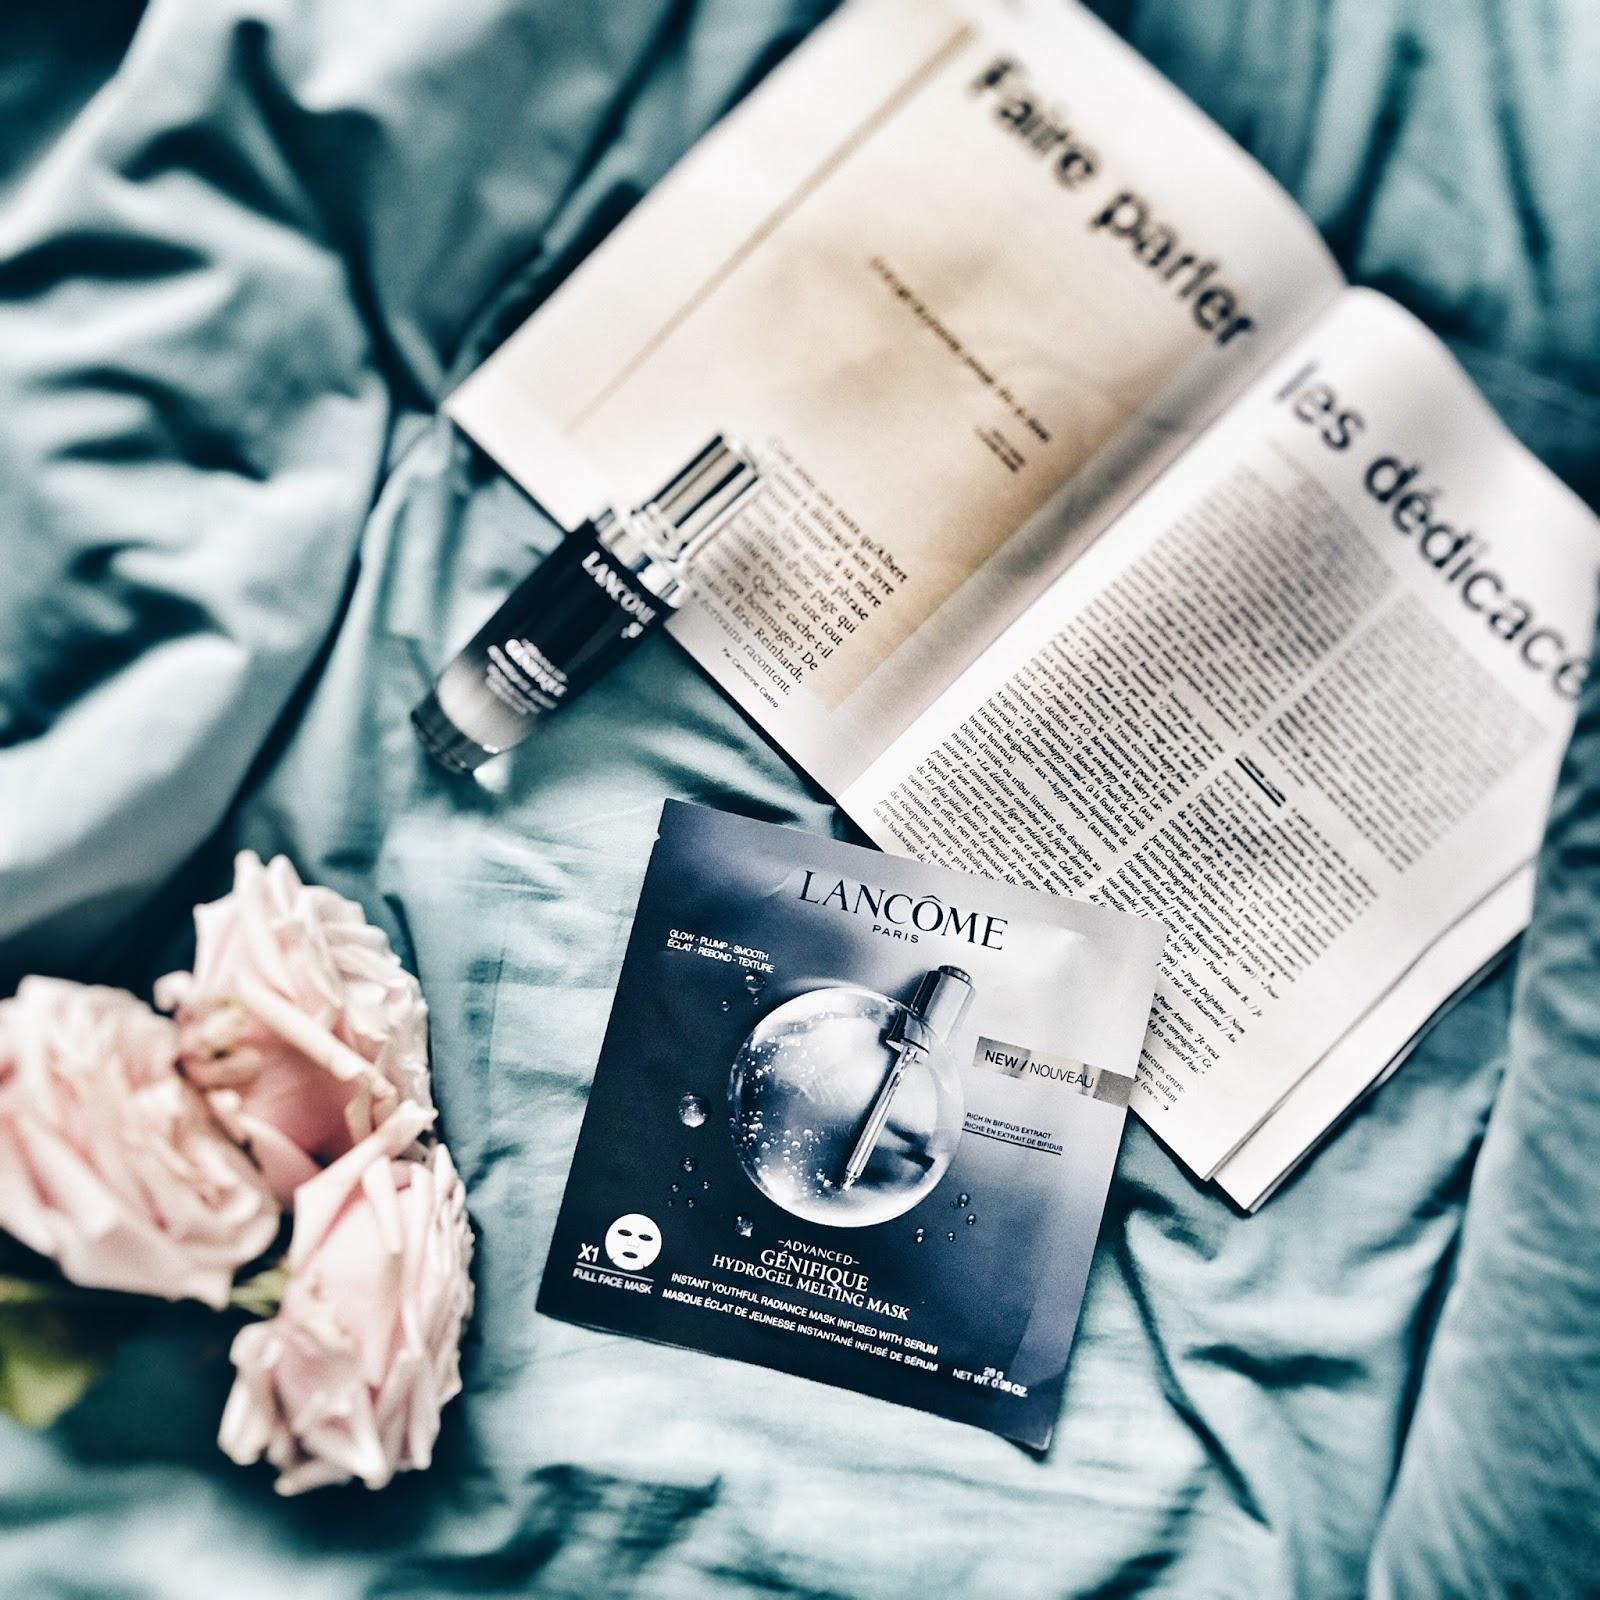 lancôme genifique hydro gel melting mask masque avis test